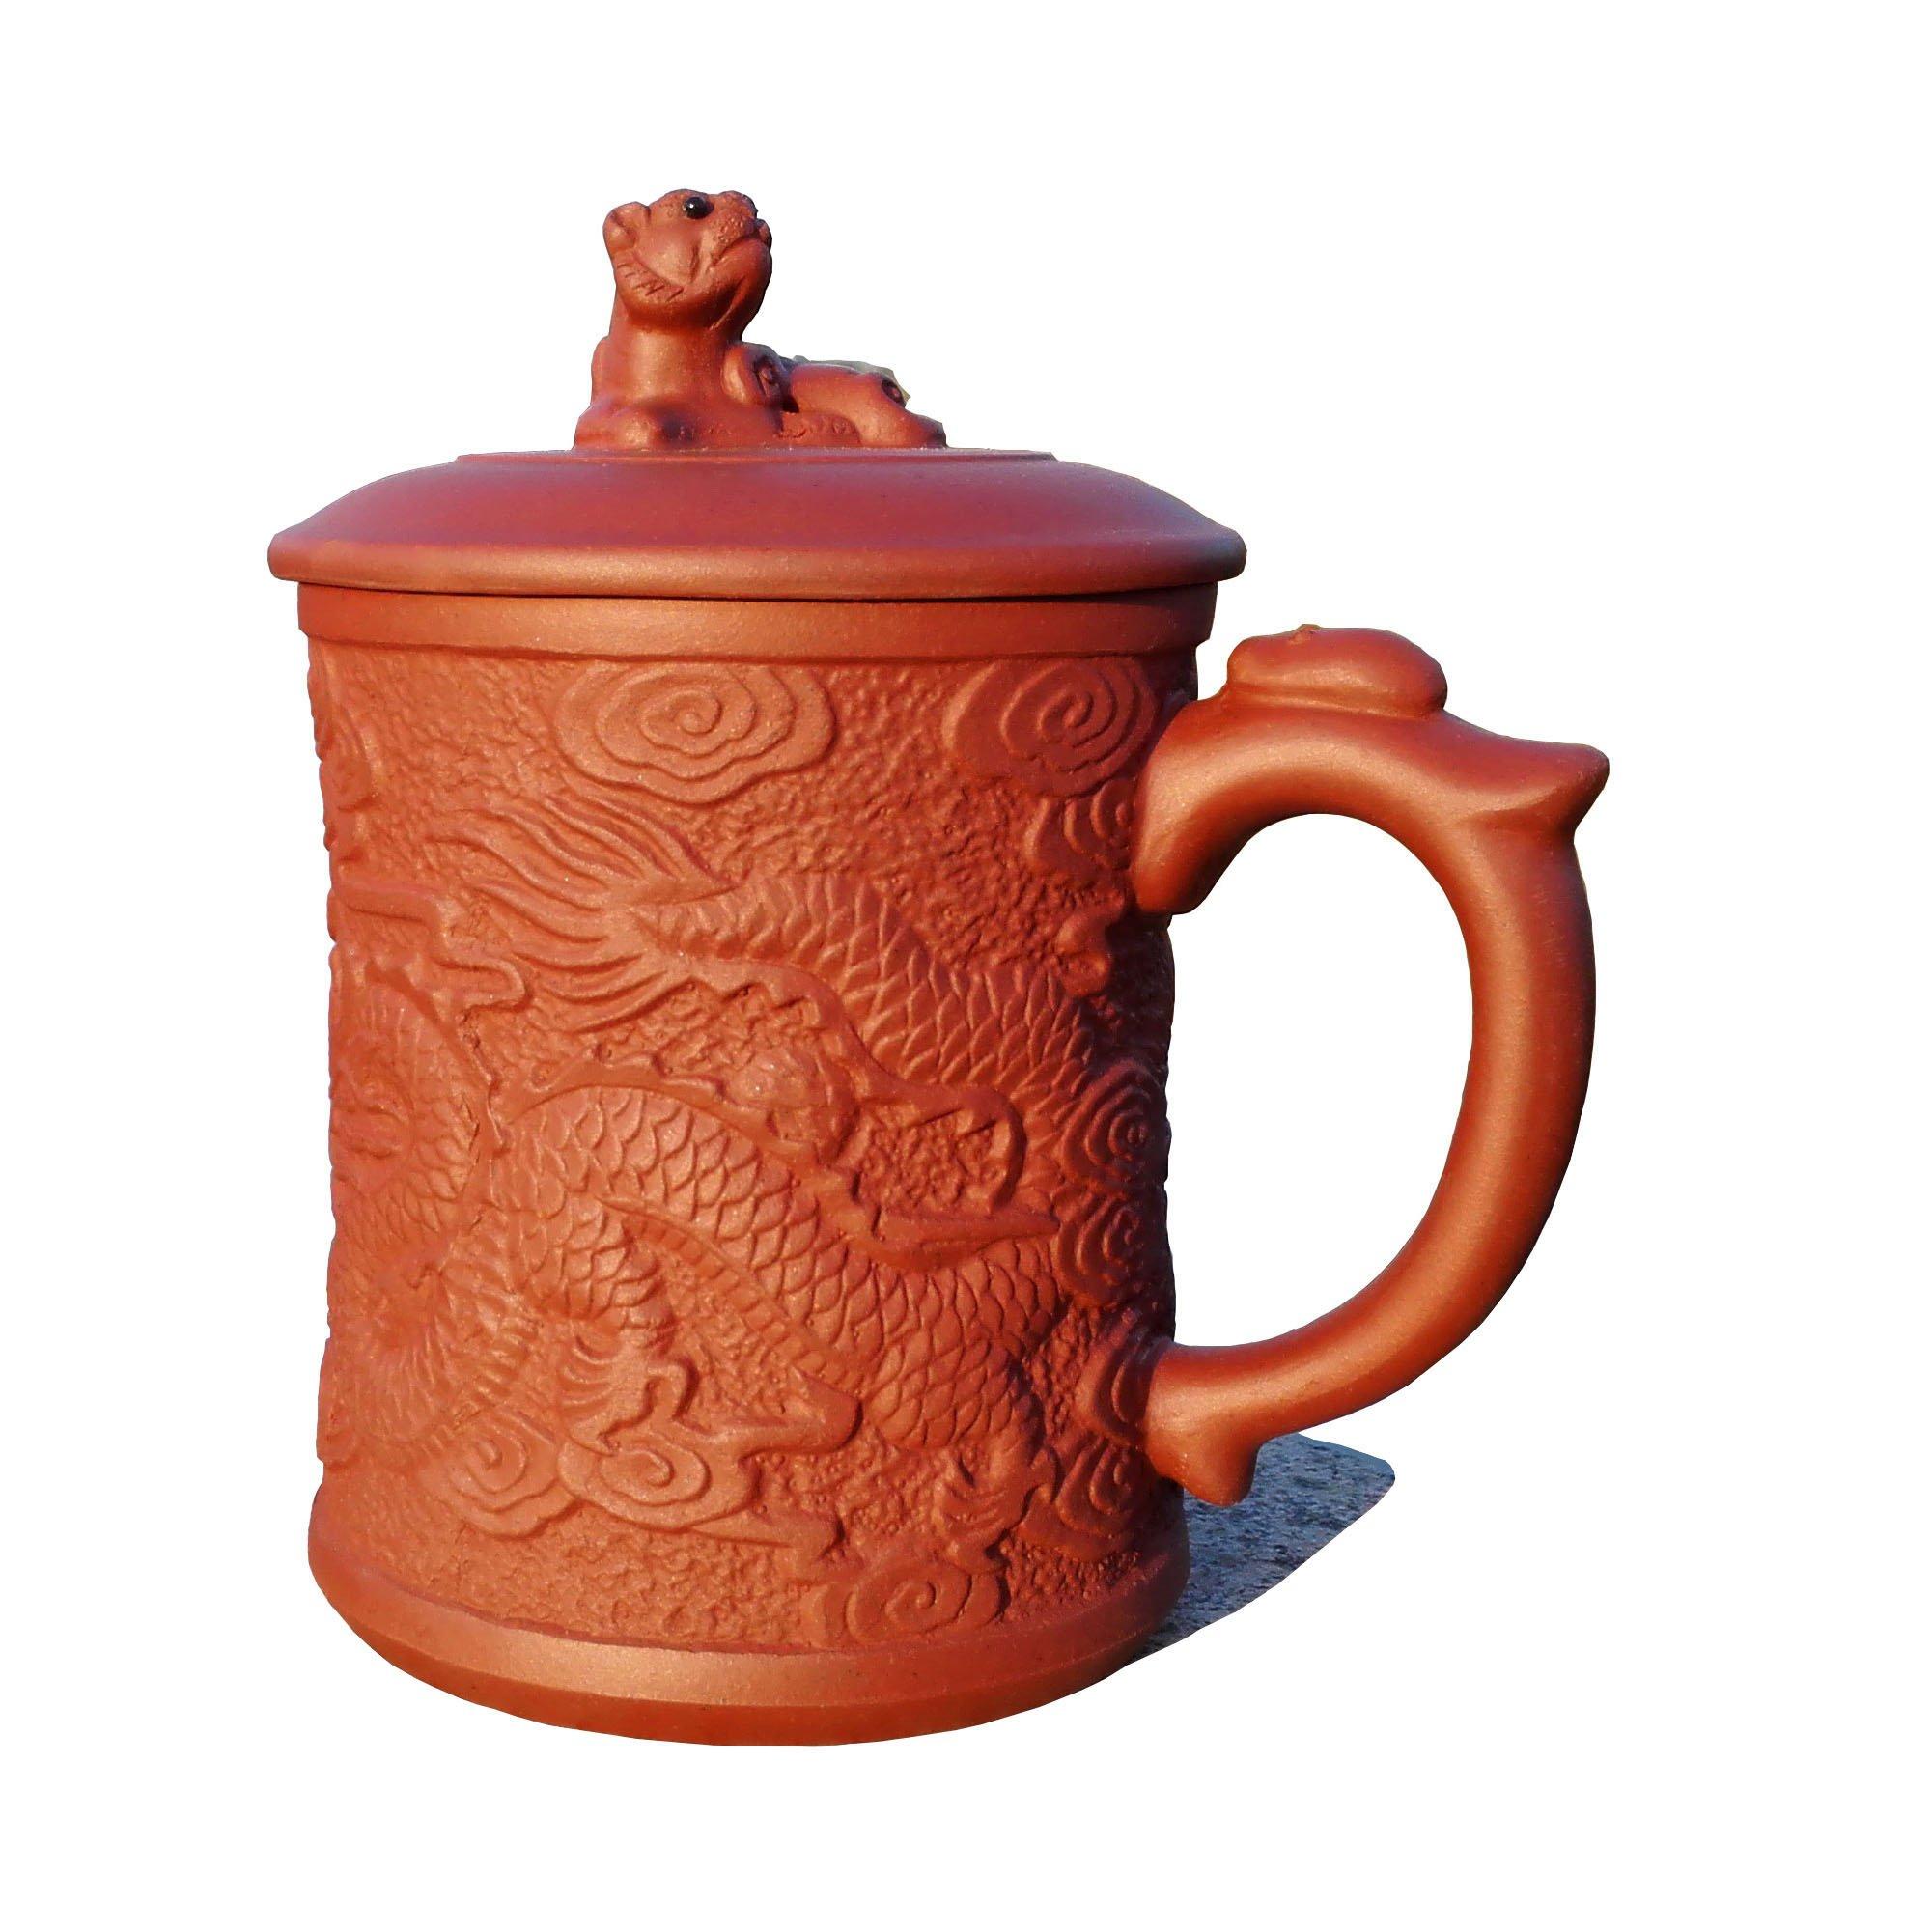 Yixing Teapot Handmade Dragons Tea Cup,Nature Red Clay,500cc